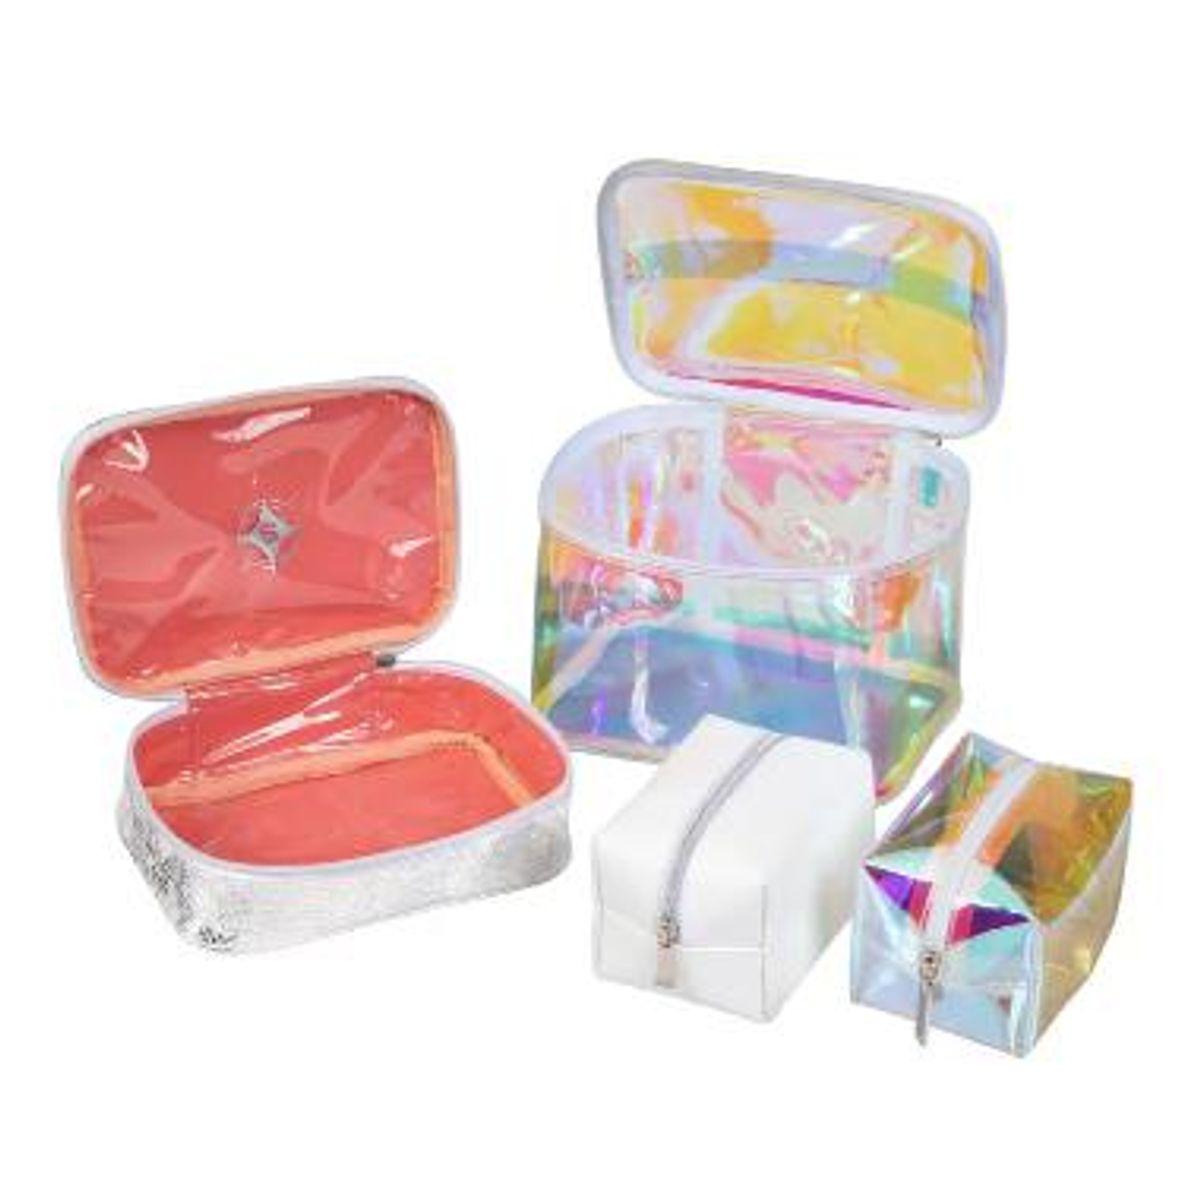 stephanie johnson miami white chloe travel organizer makeup case